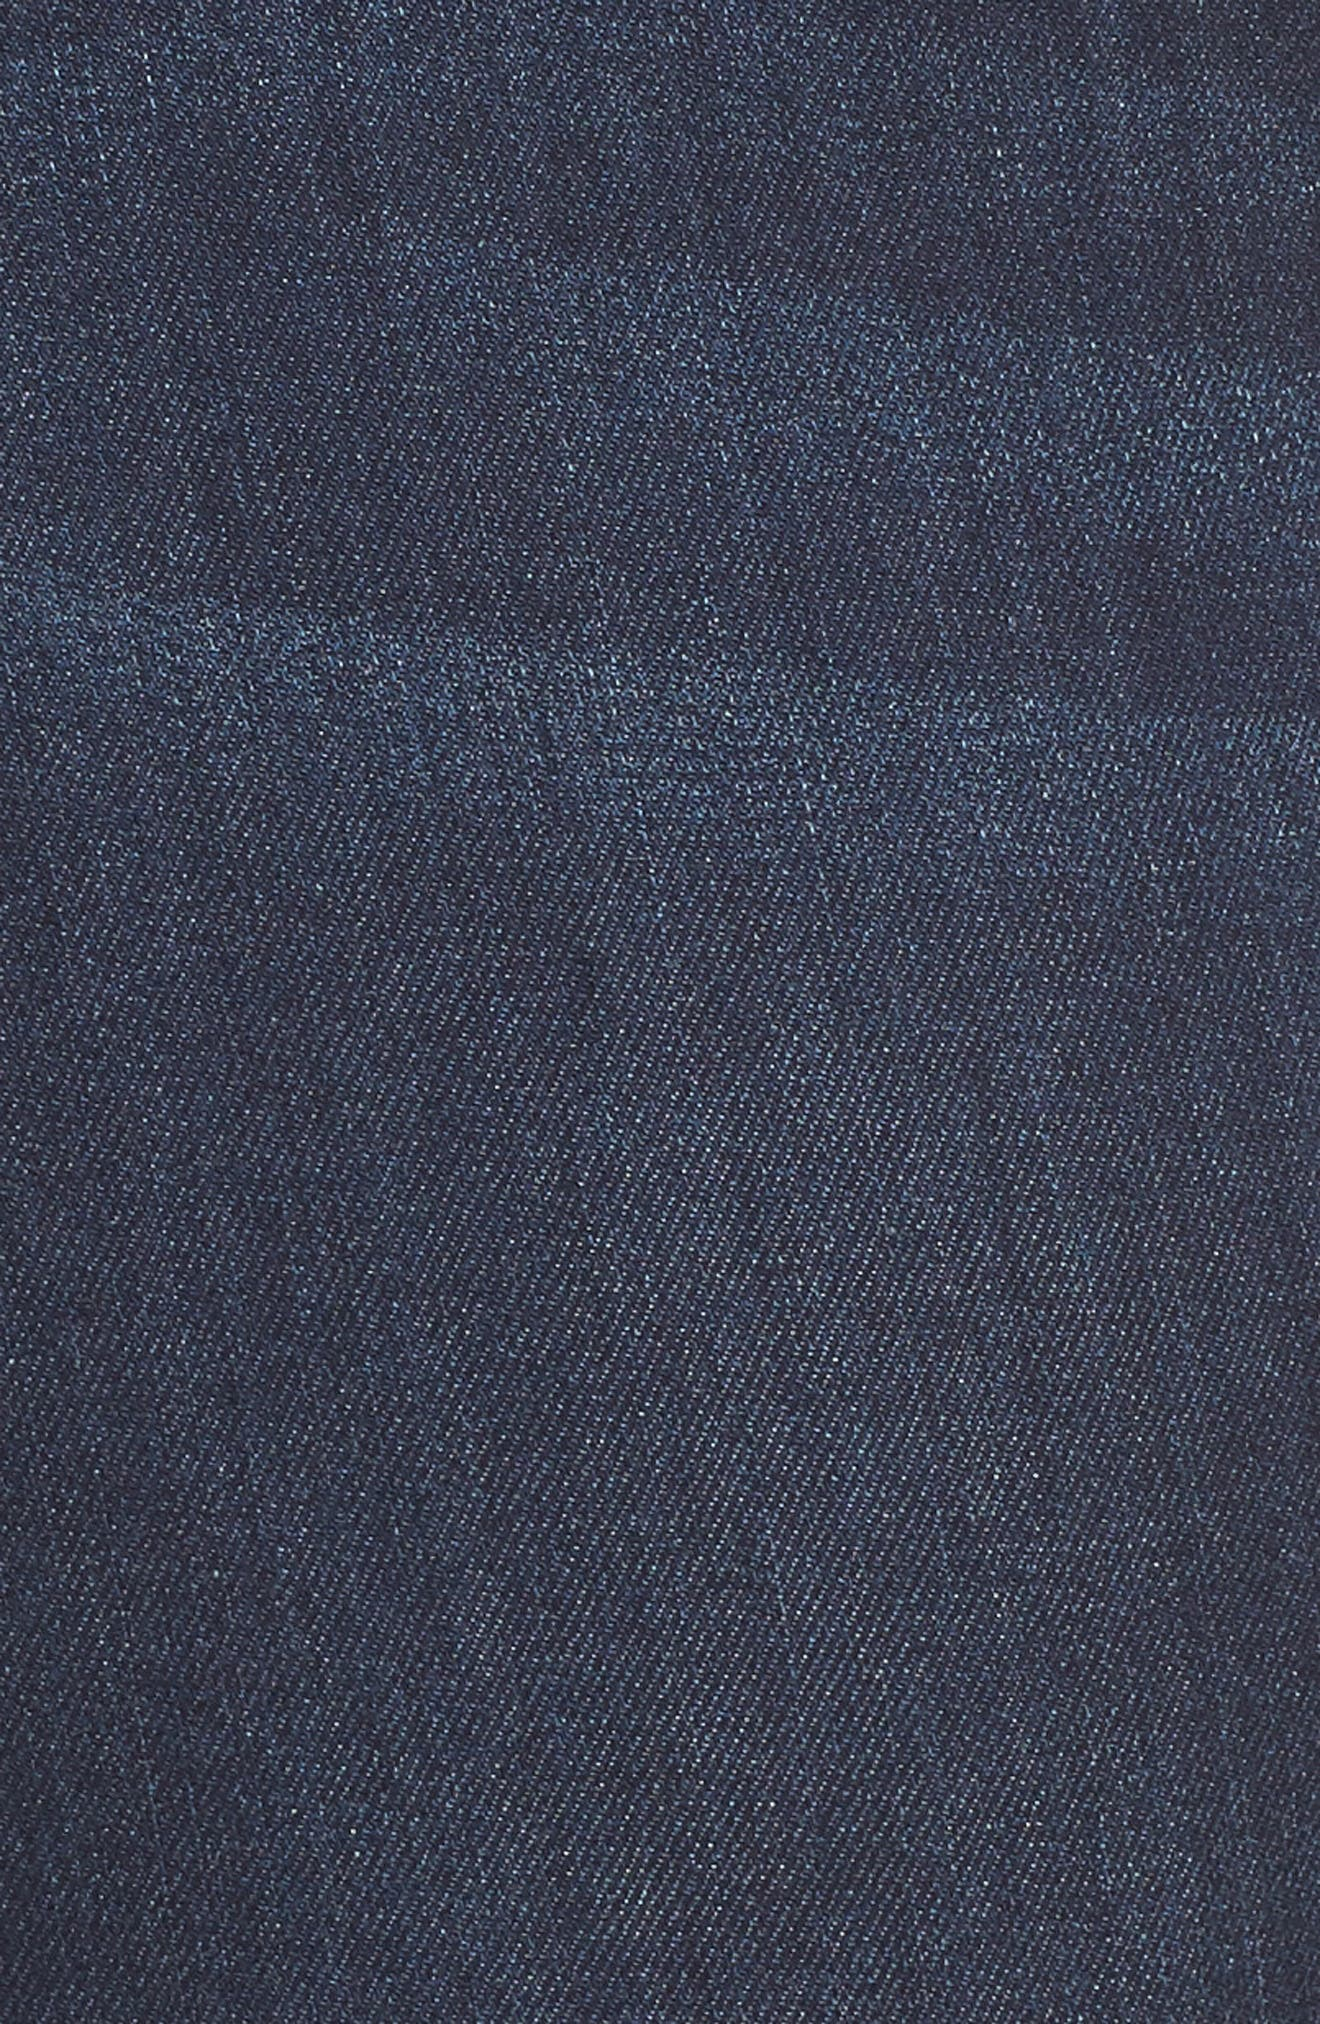 Sienna Pull-On Denim Capri Pants,                             Alternate thumbnail 6, color,                             GRIFFITH SUPER DARK